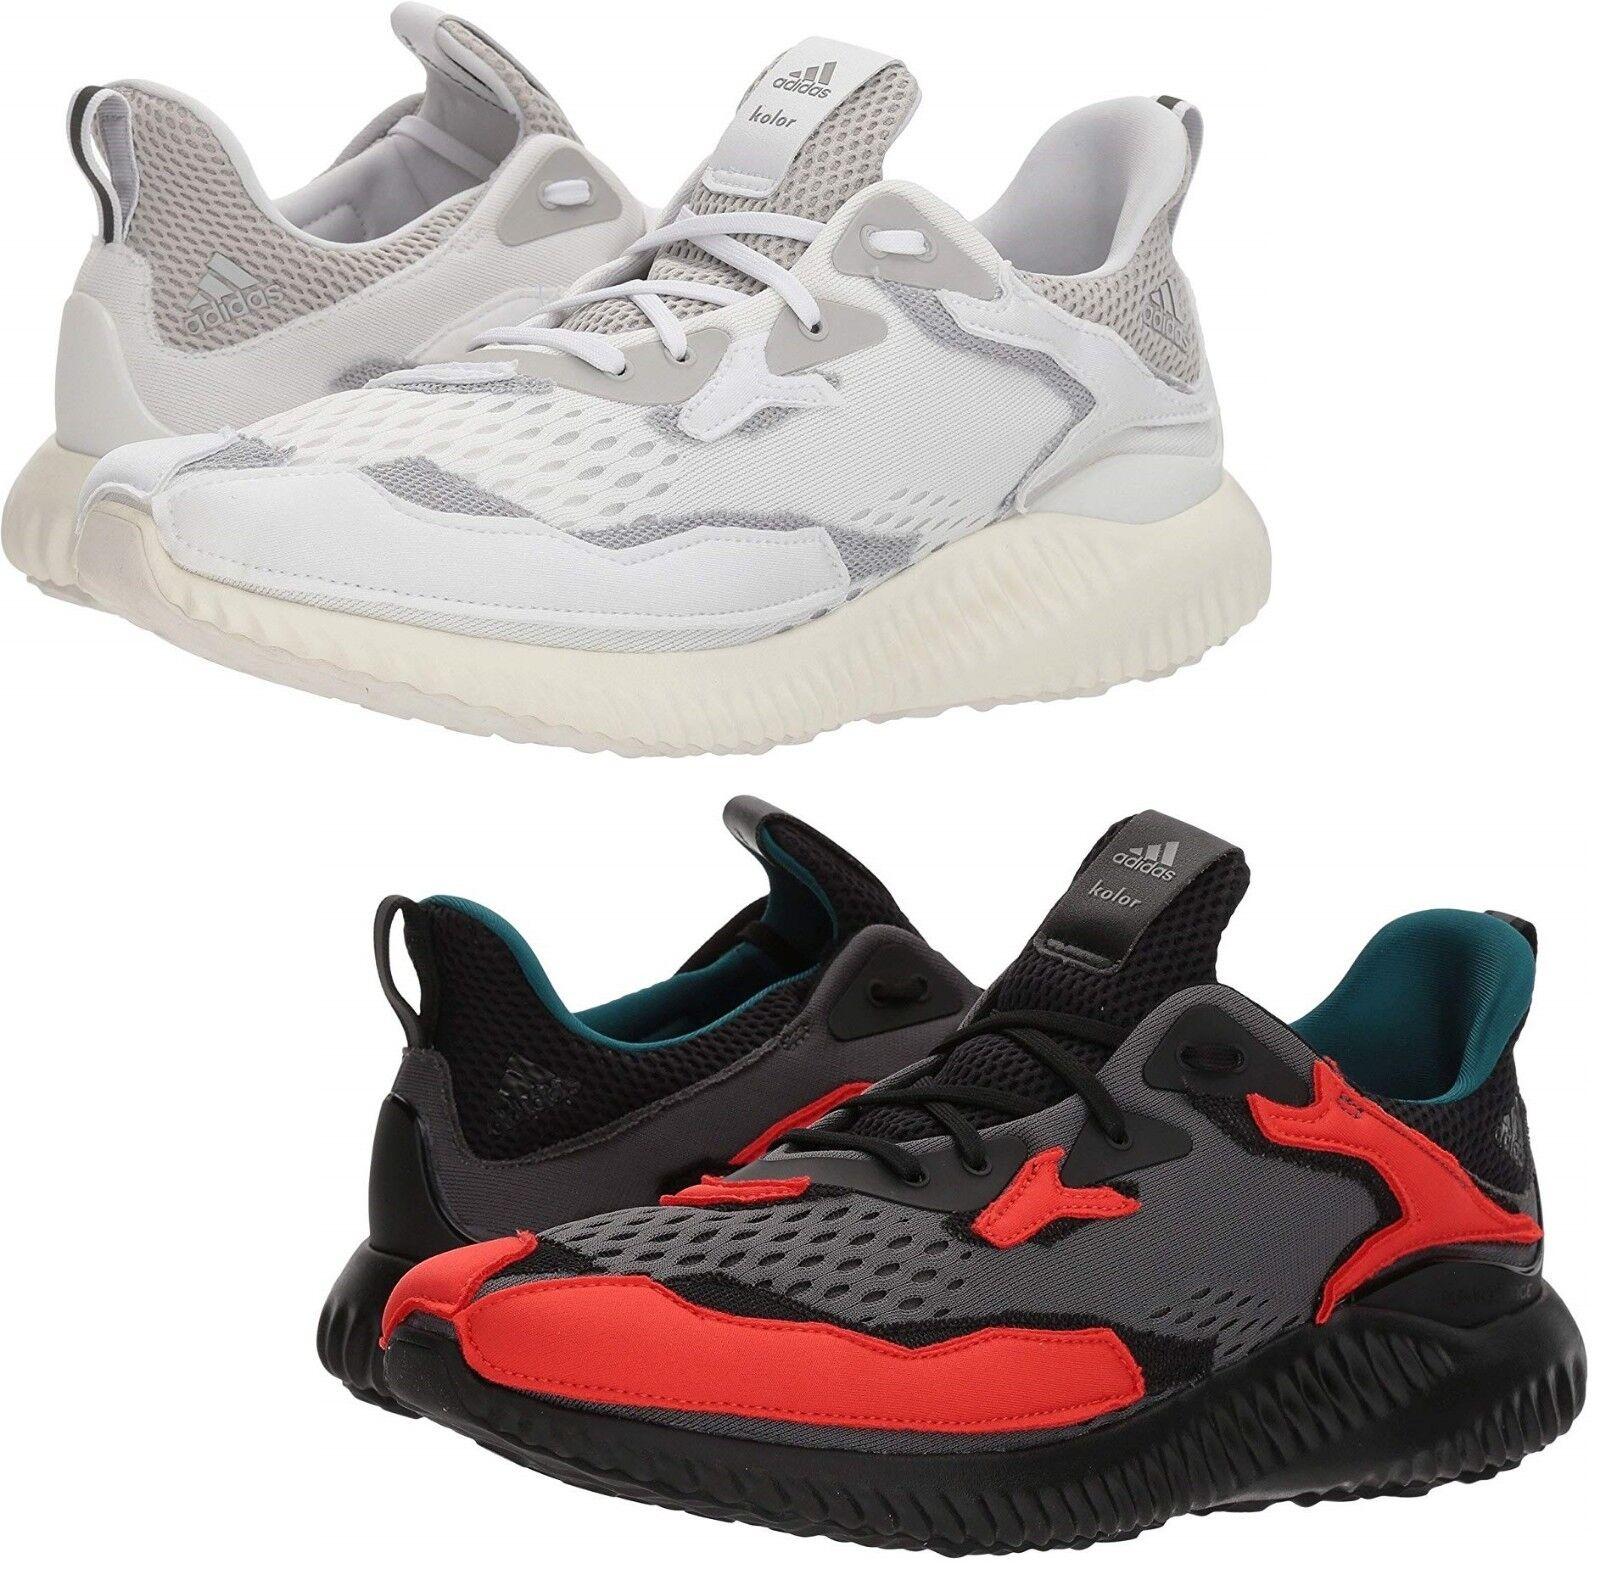 sports shoes d2afc ff44b adidas x Kolor Men's alphabounce Running Sneaker Shoes